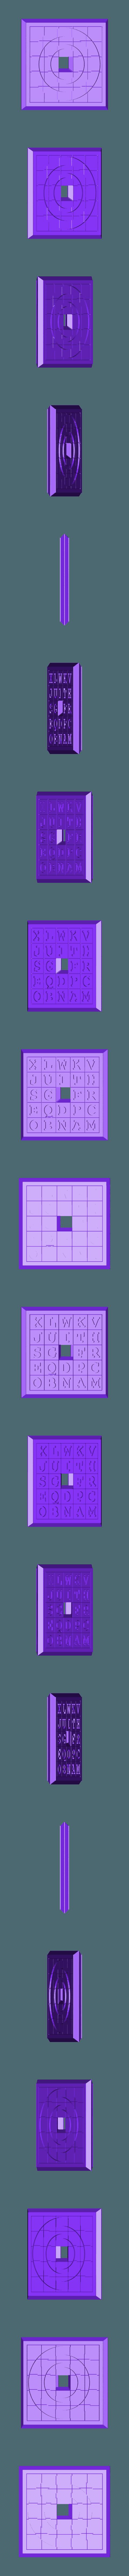 Sliding5x5Puzzle3.stl Download STL file Two Sided Sliding Puzzle • 3D printable model, Jinja